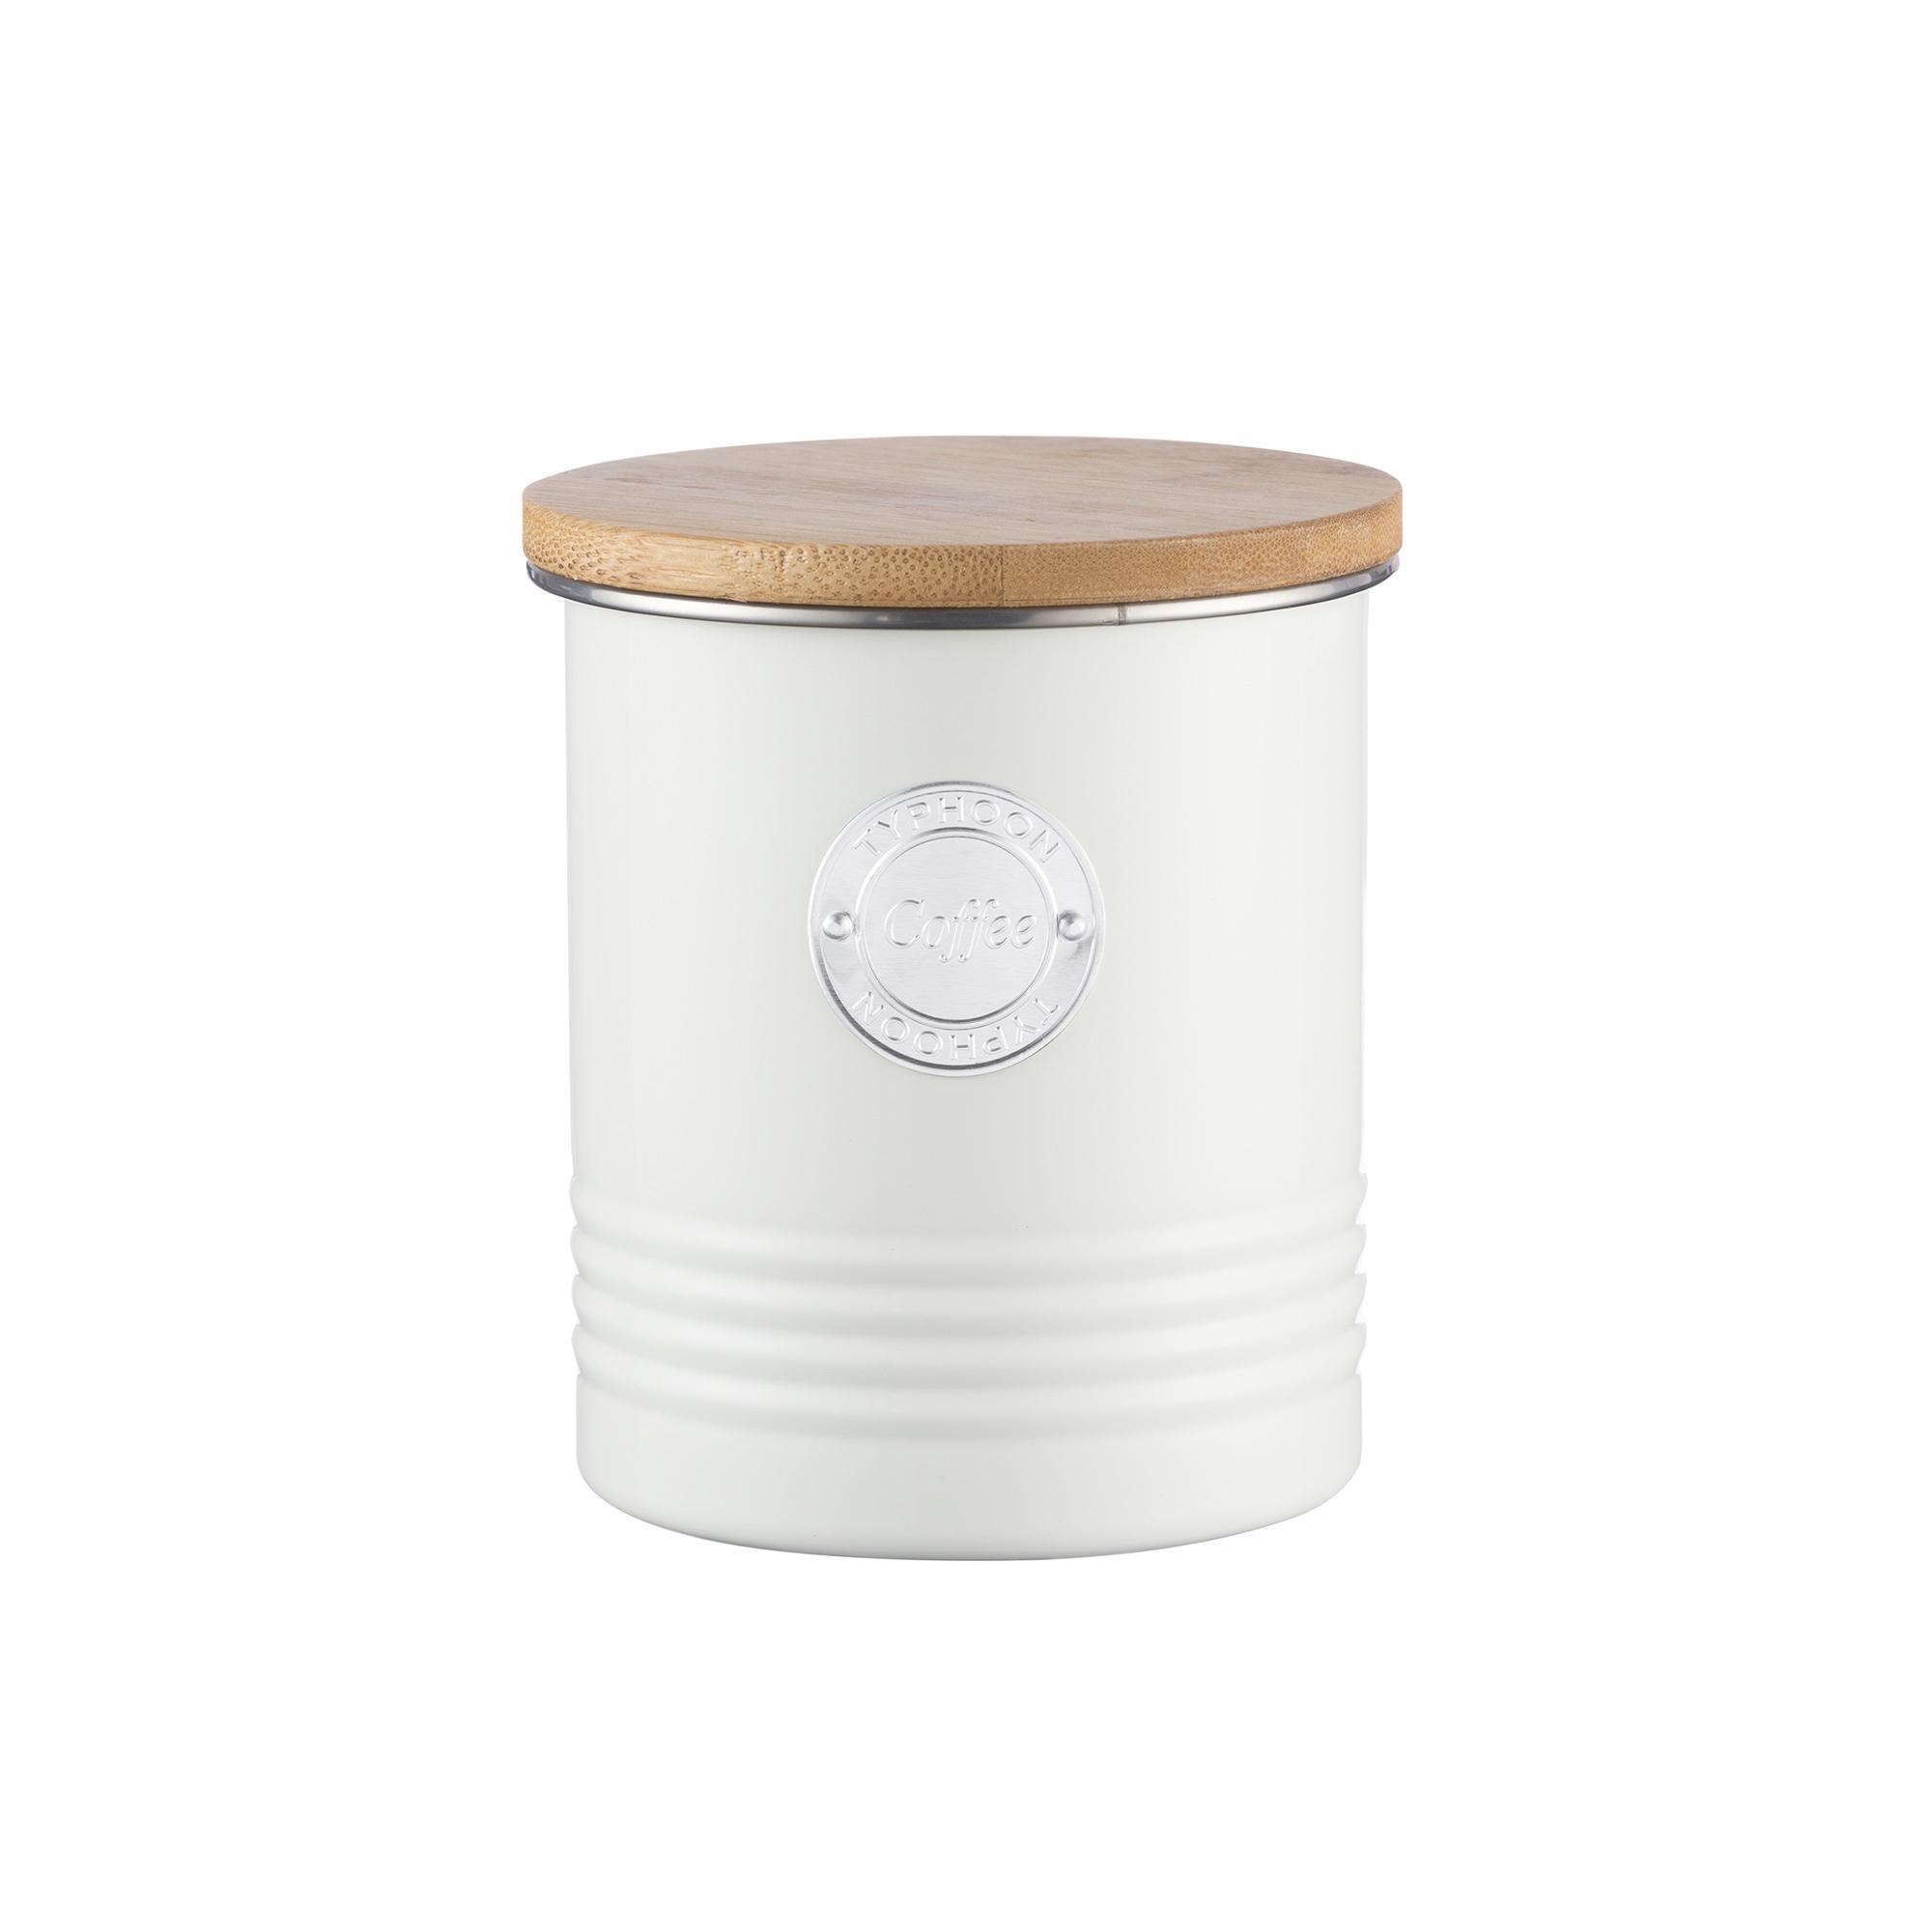 Typhoon Living Cream Coffee Canister